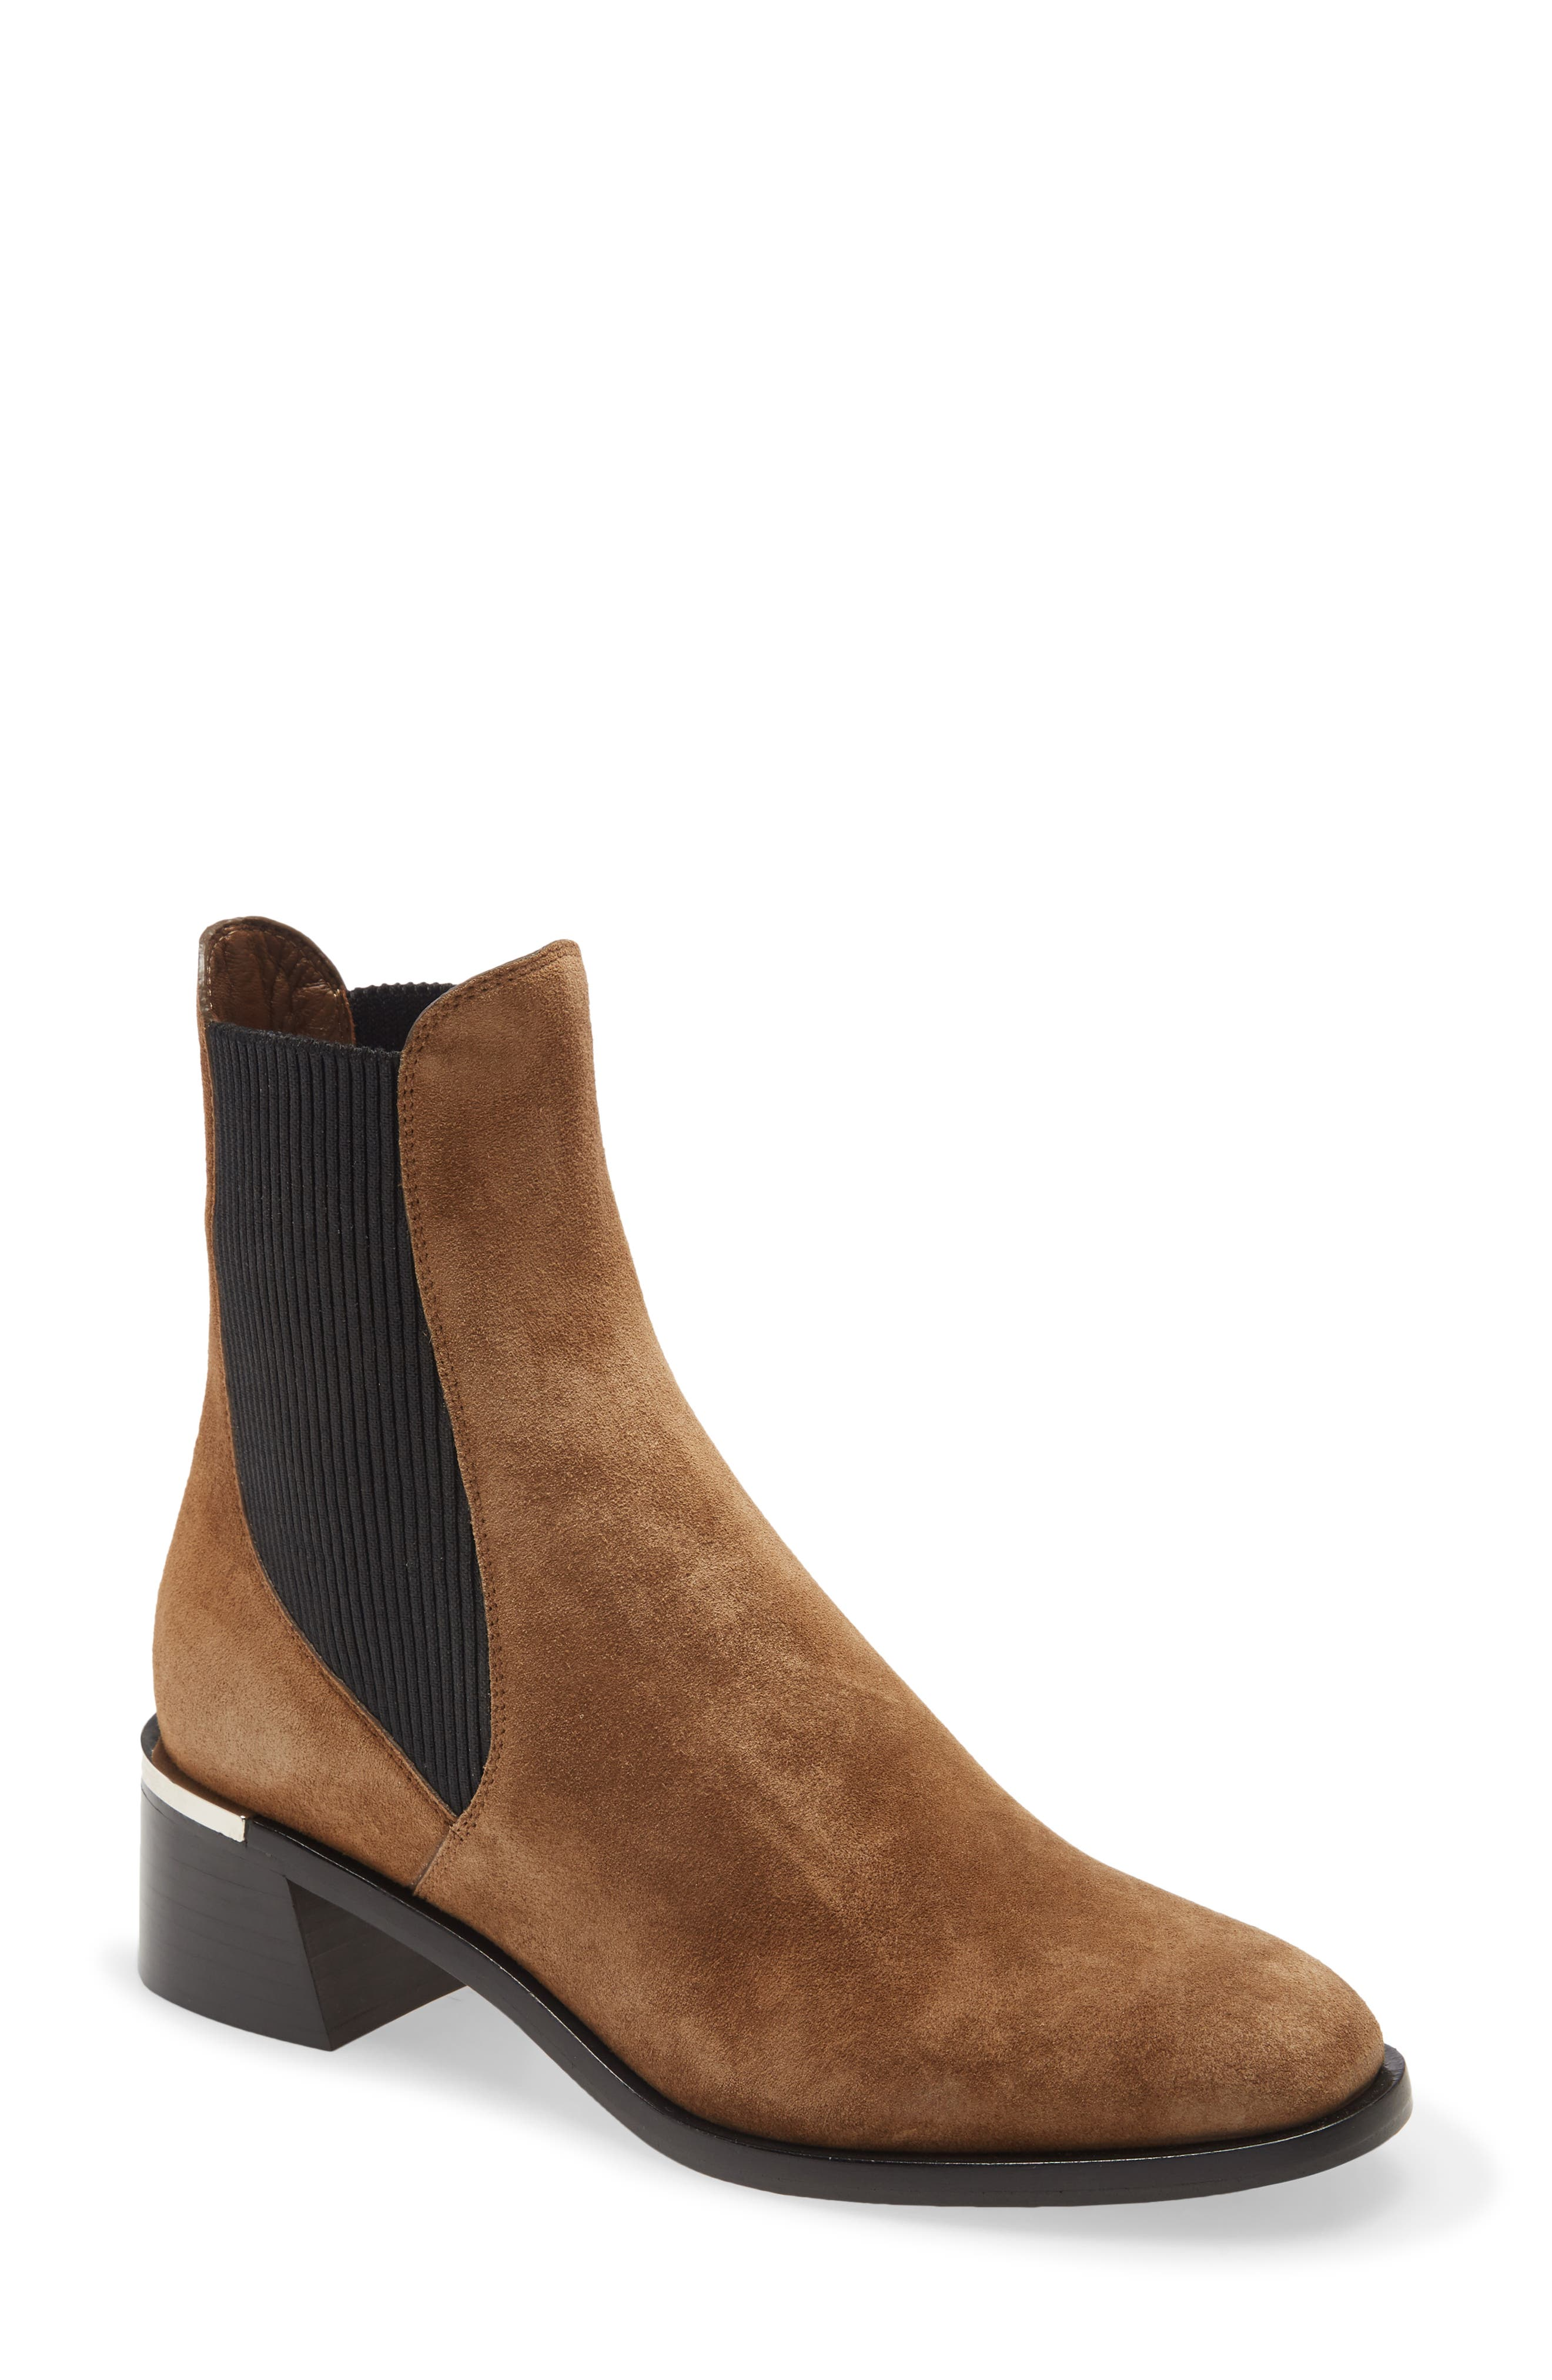 Women's Jimmy Choo Boots | Nordstrom